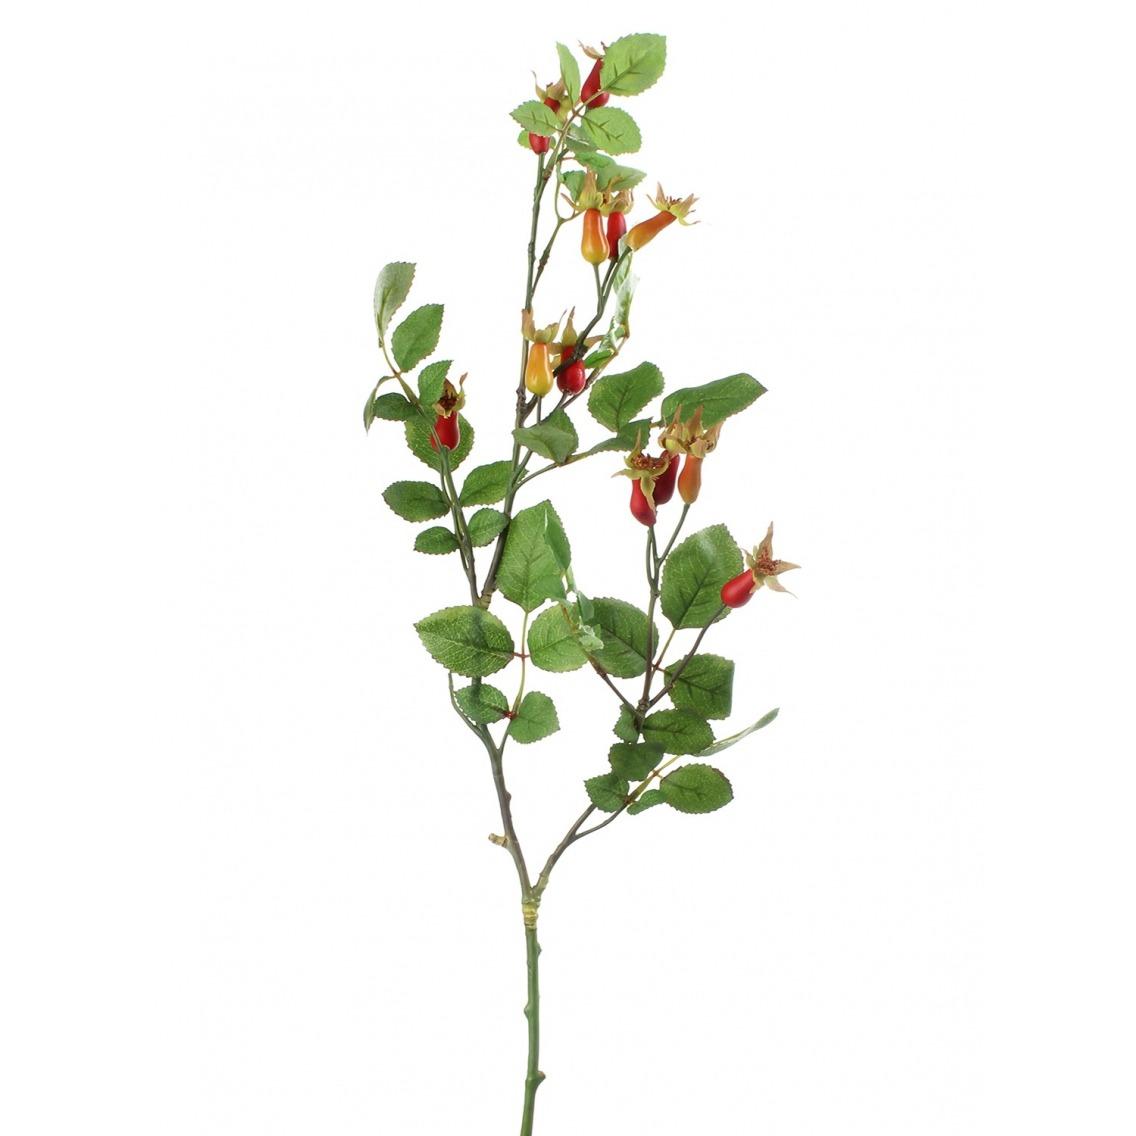 Branche d'églantier fleuri